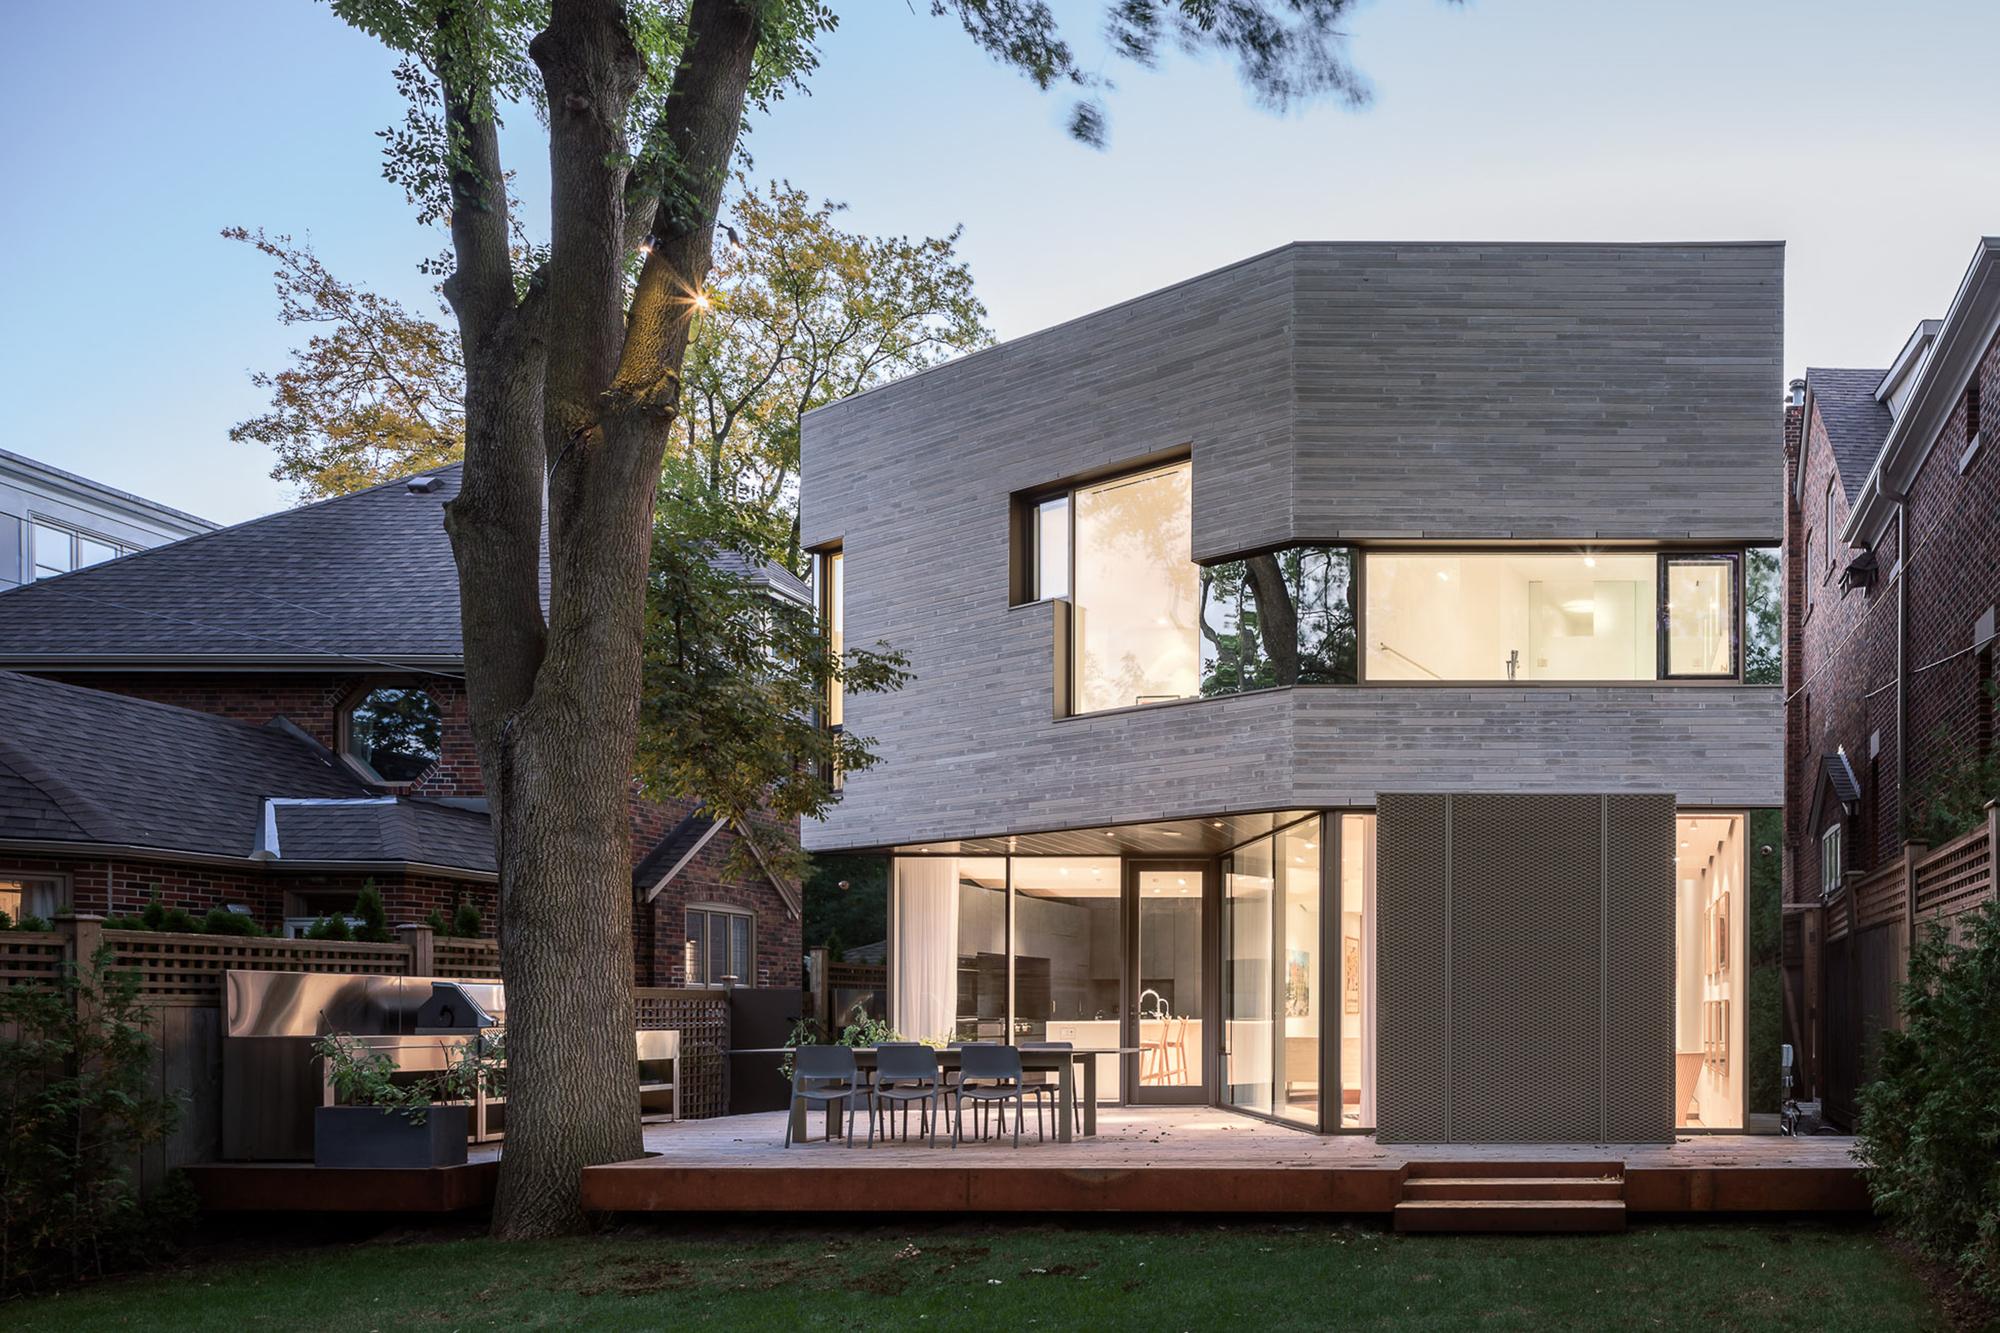 Rosemary House / Kohn Shnier Architects